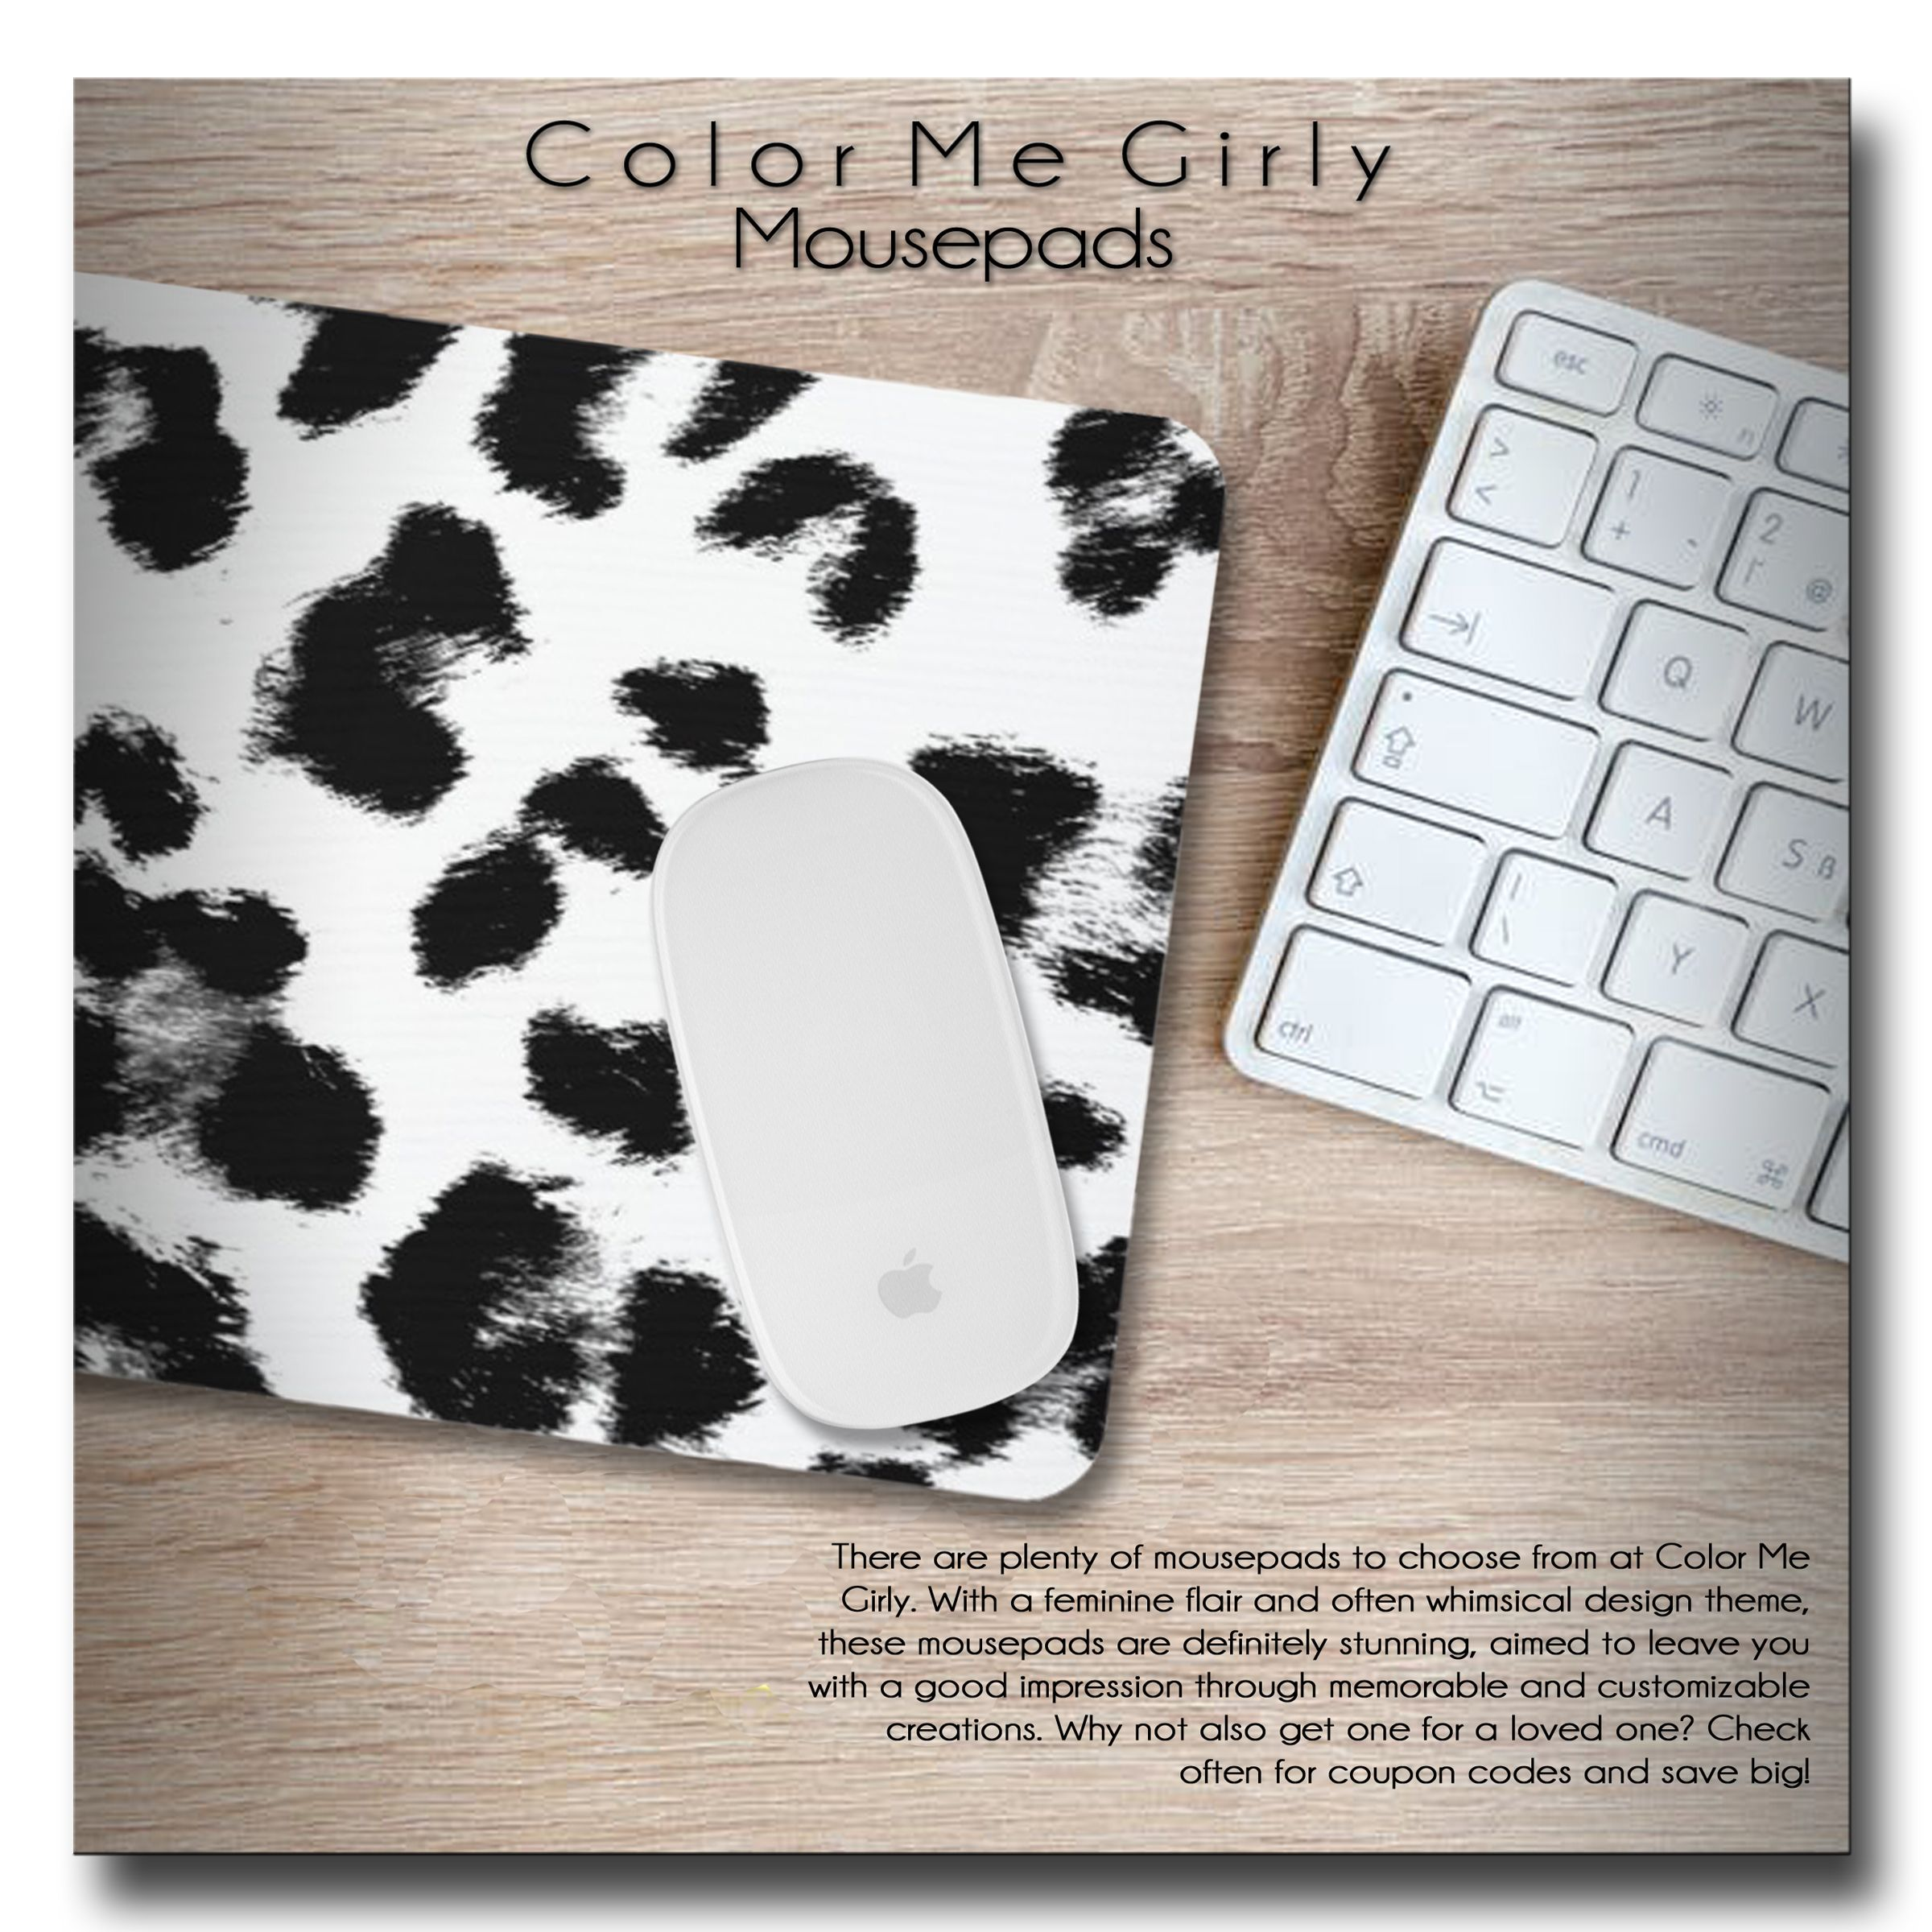 Merveilleux ... Leopard, Leopard Print, Animal Print, Leopard Spots, Spotted, Trendy,  Elegant, Cute, Mousepad, Mousepads, Mouse Pad, Mouse Pad, Office, Office  Supplies, ...